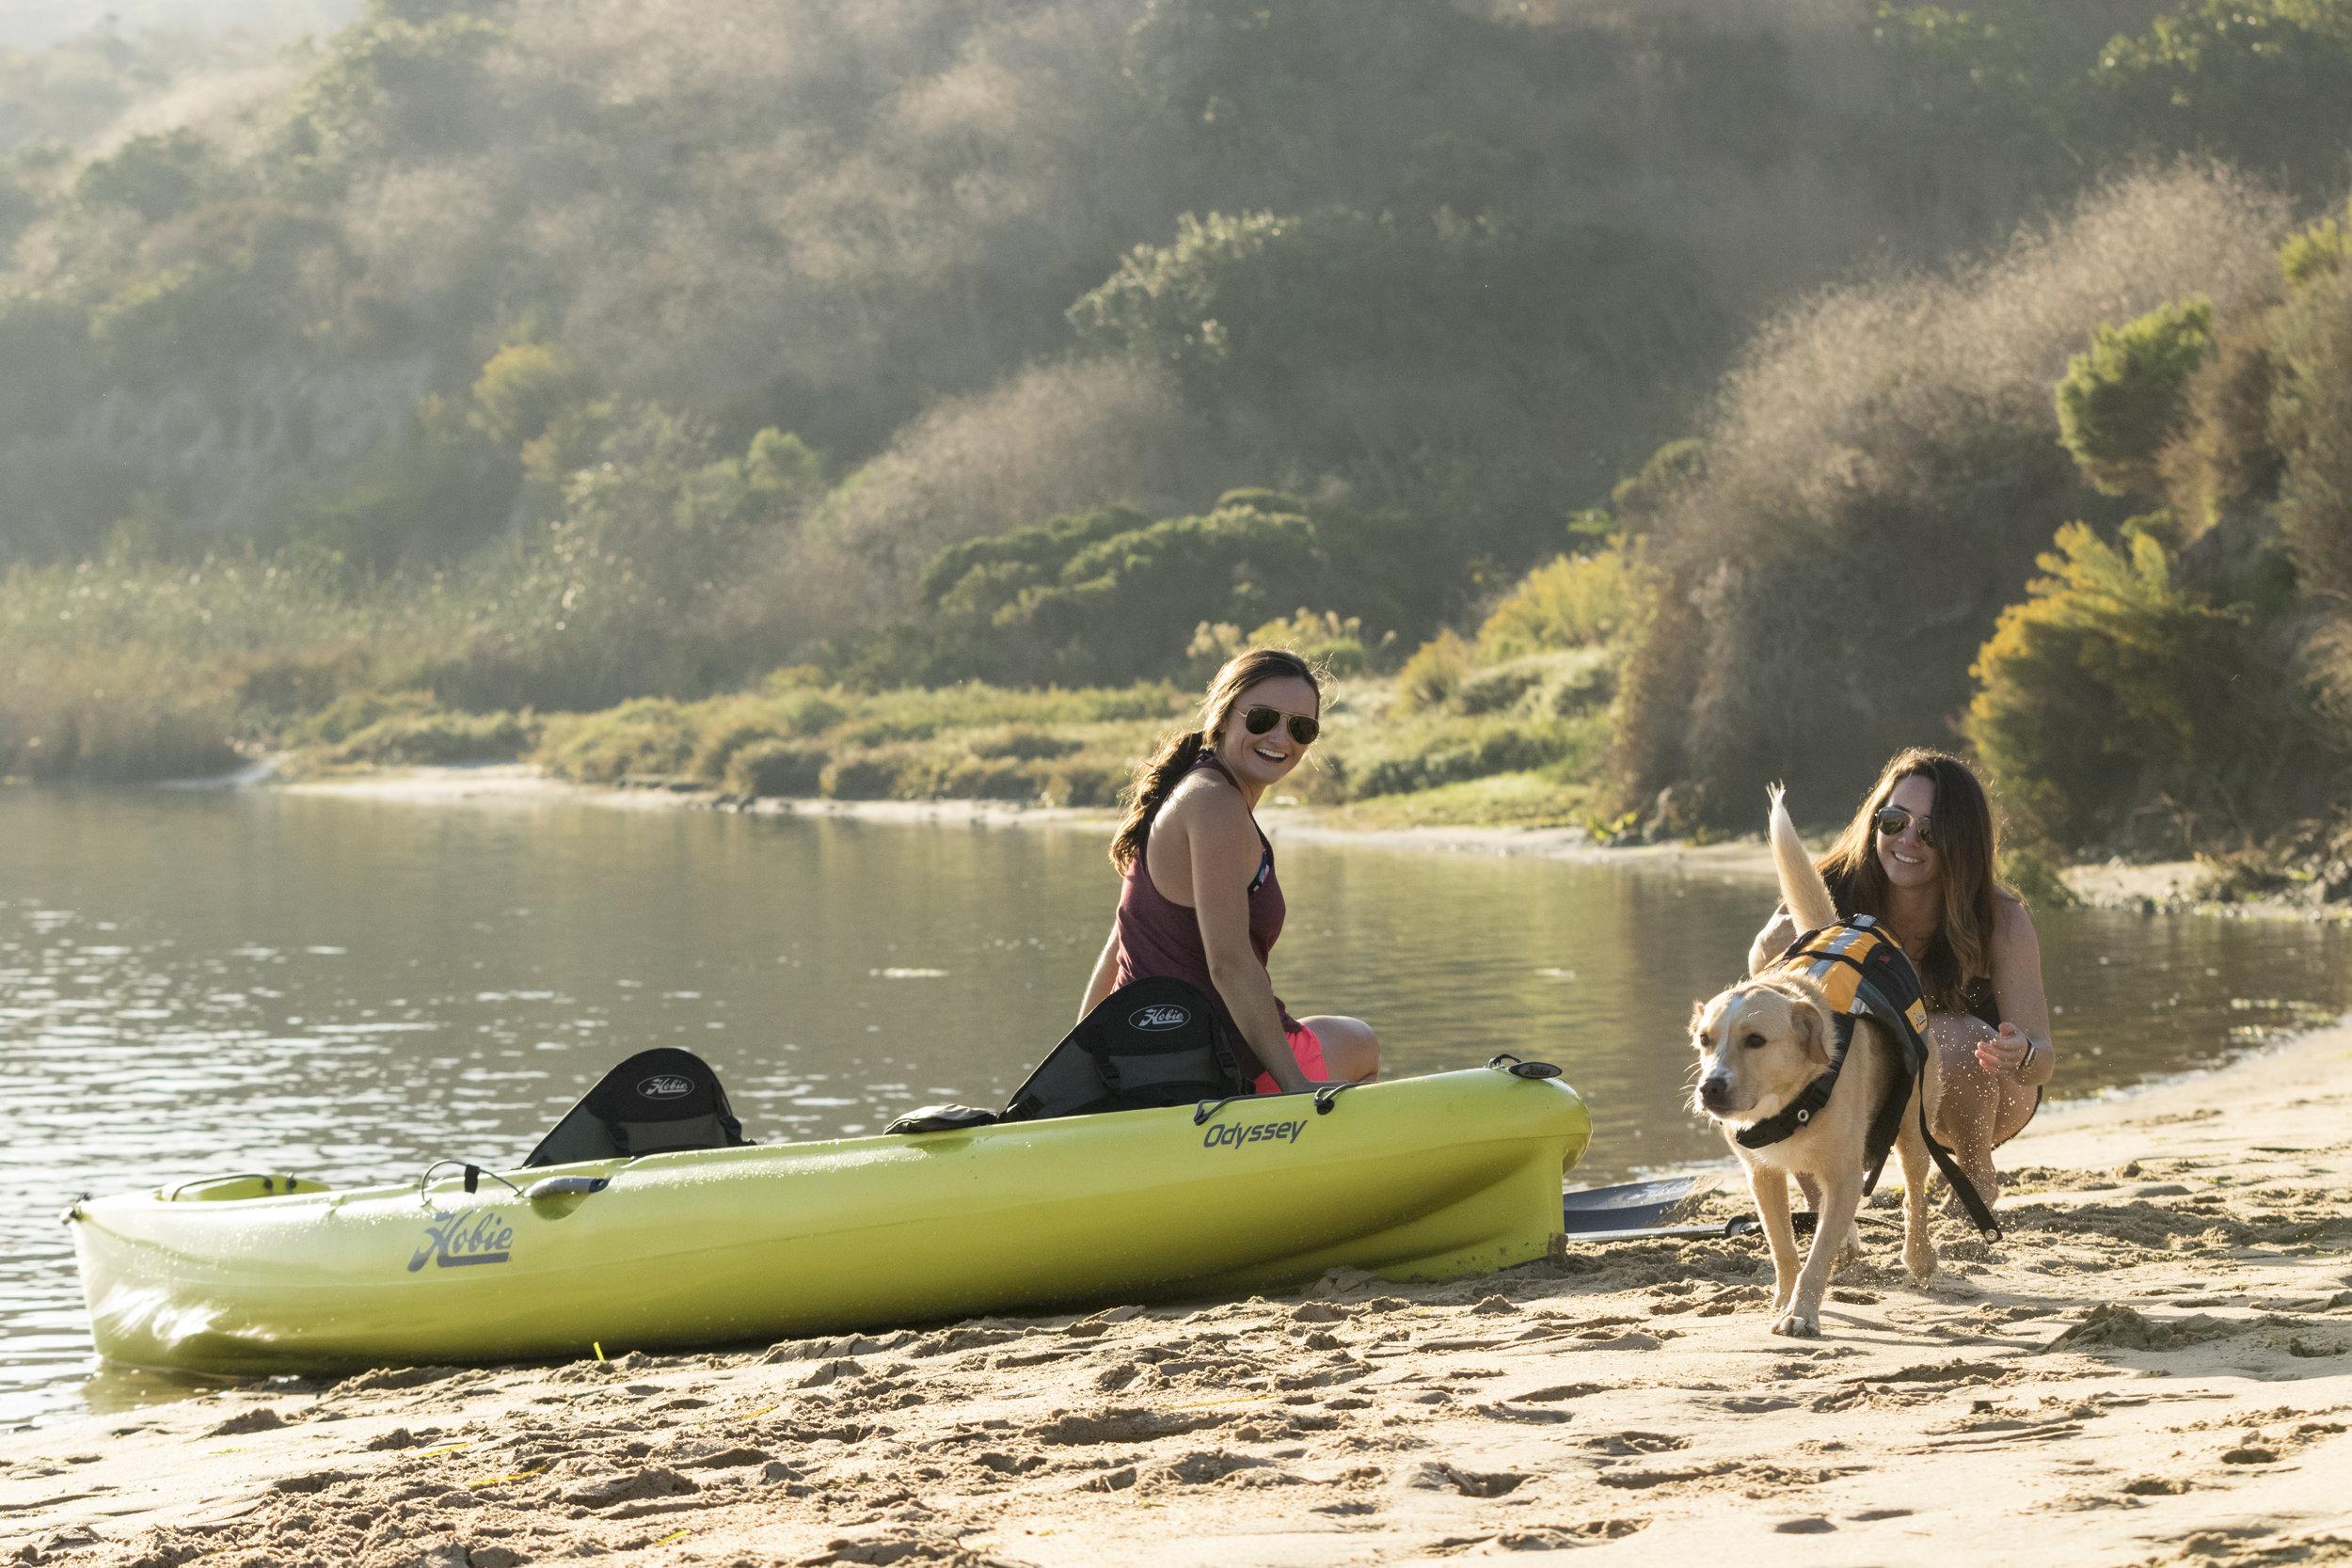 Odyssey_action_beach_seagrass_lagoon_dog_females.jpg